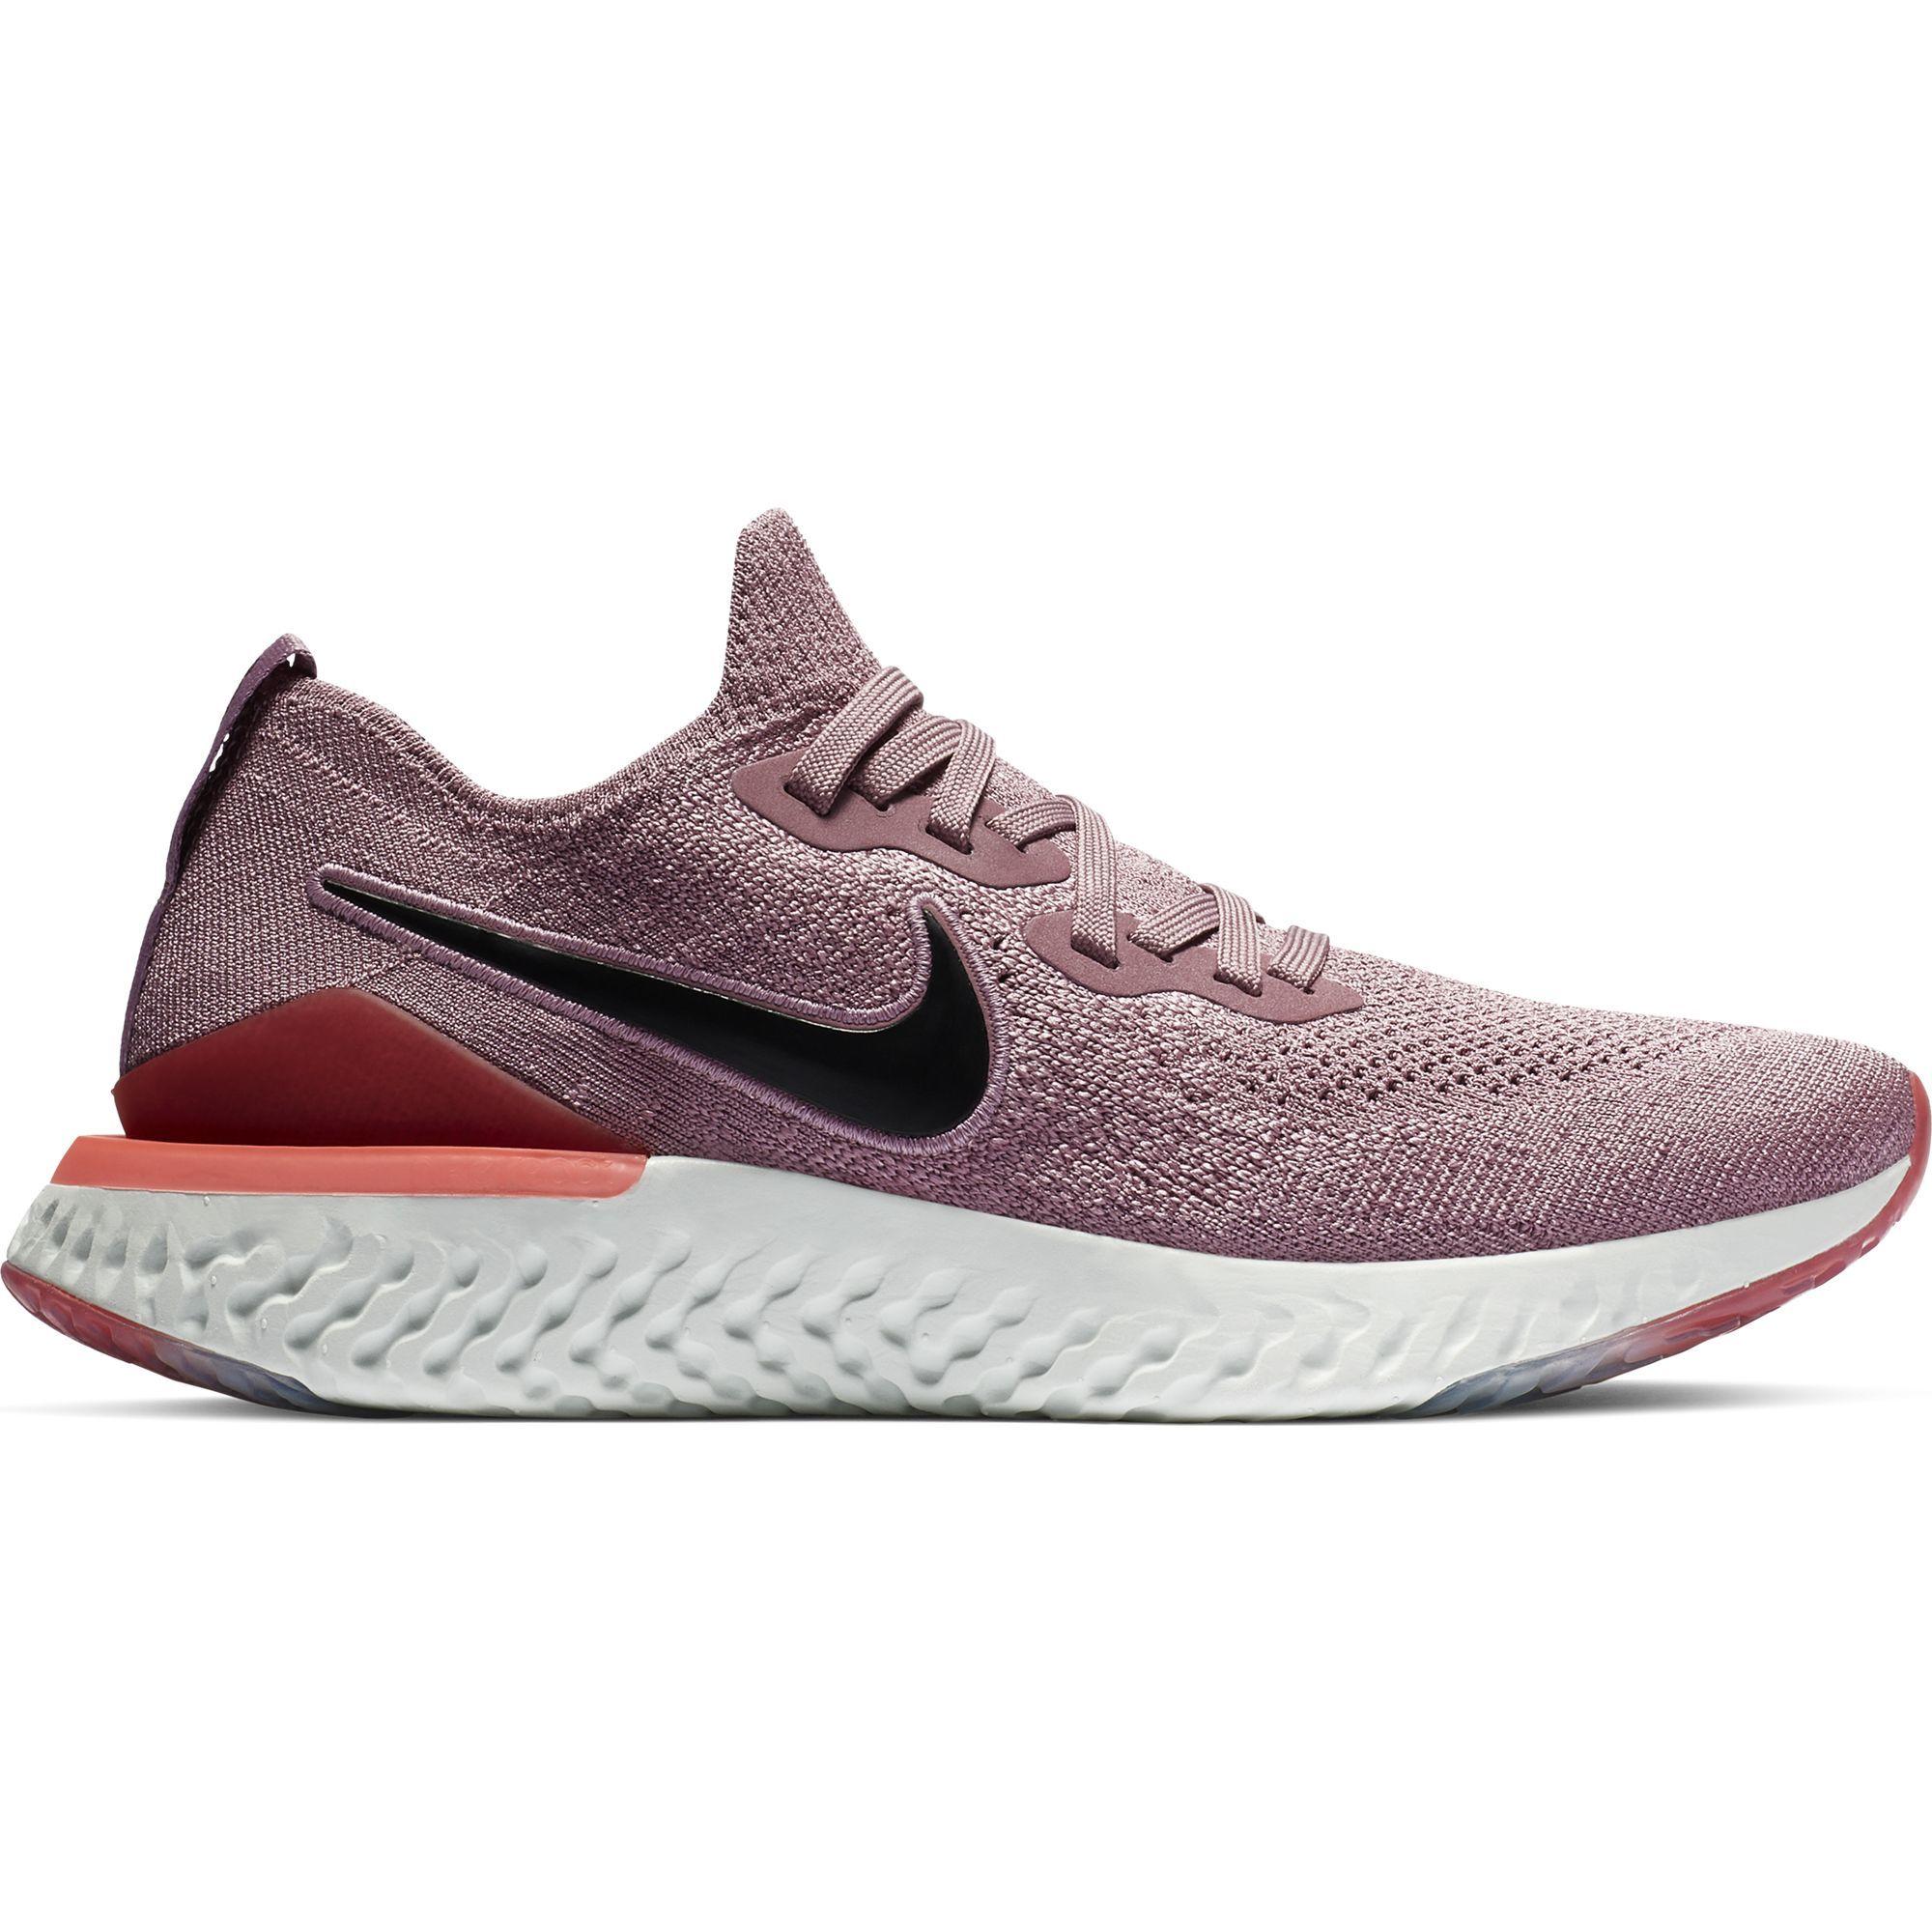 Nike Lady Epic React Flyknit 2 in Rosa